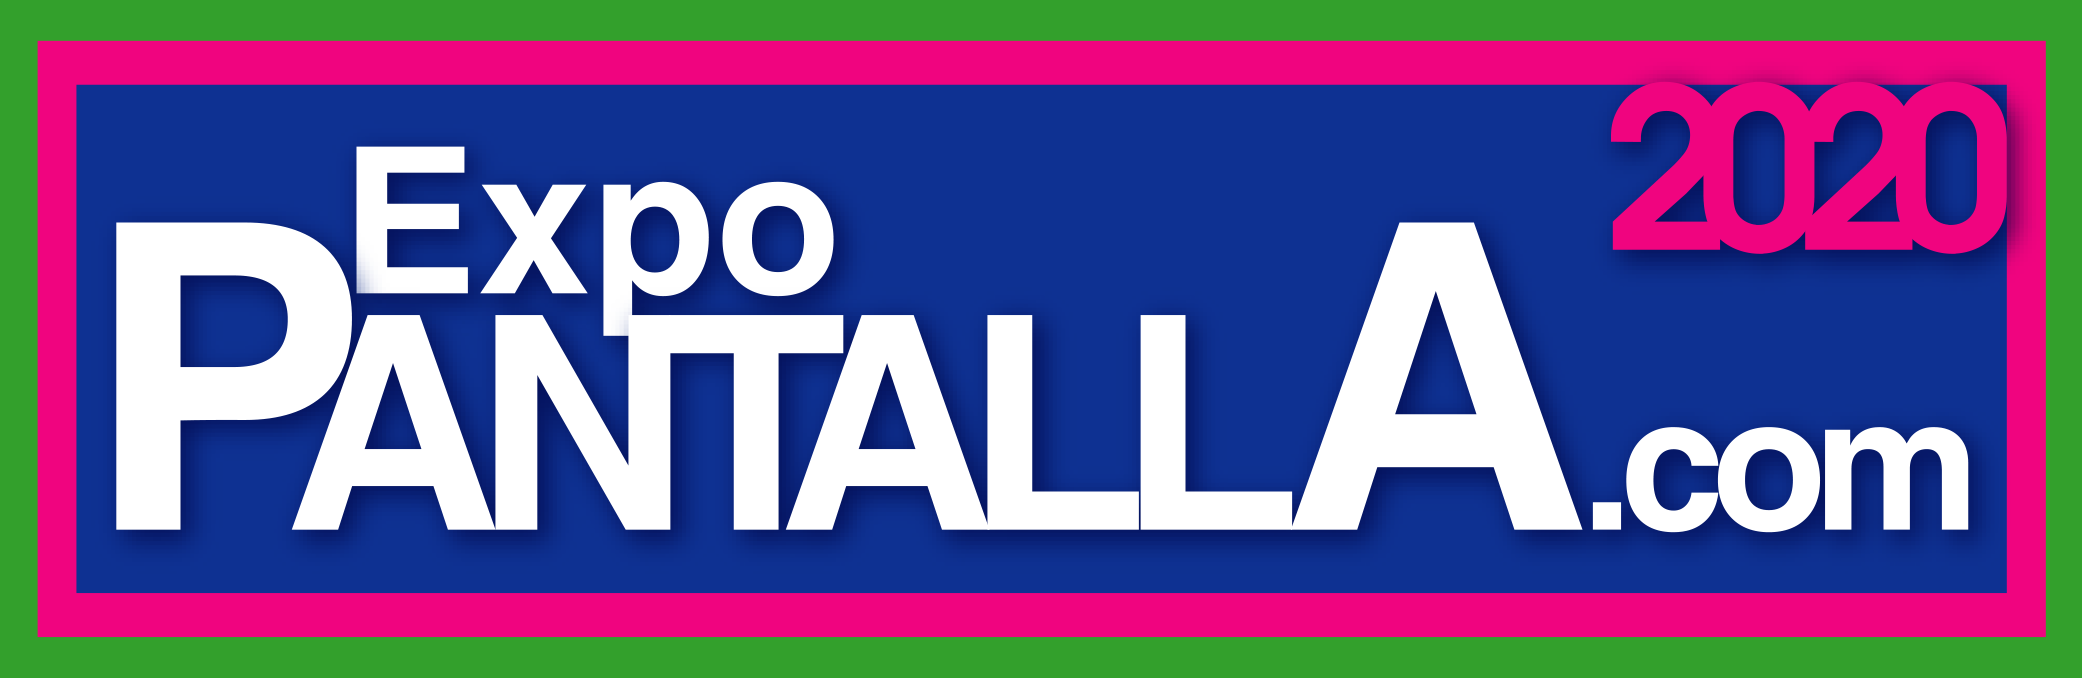 Expo Pantalla